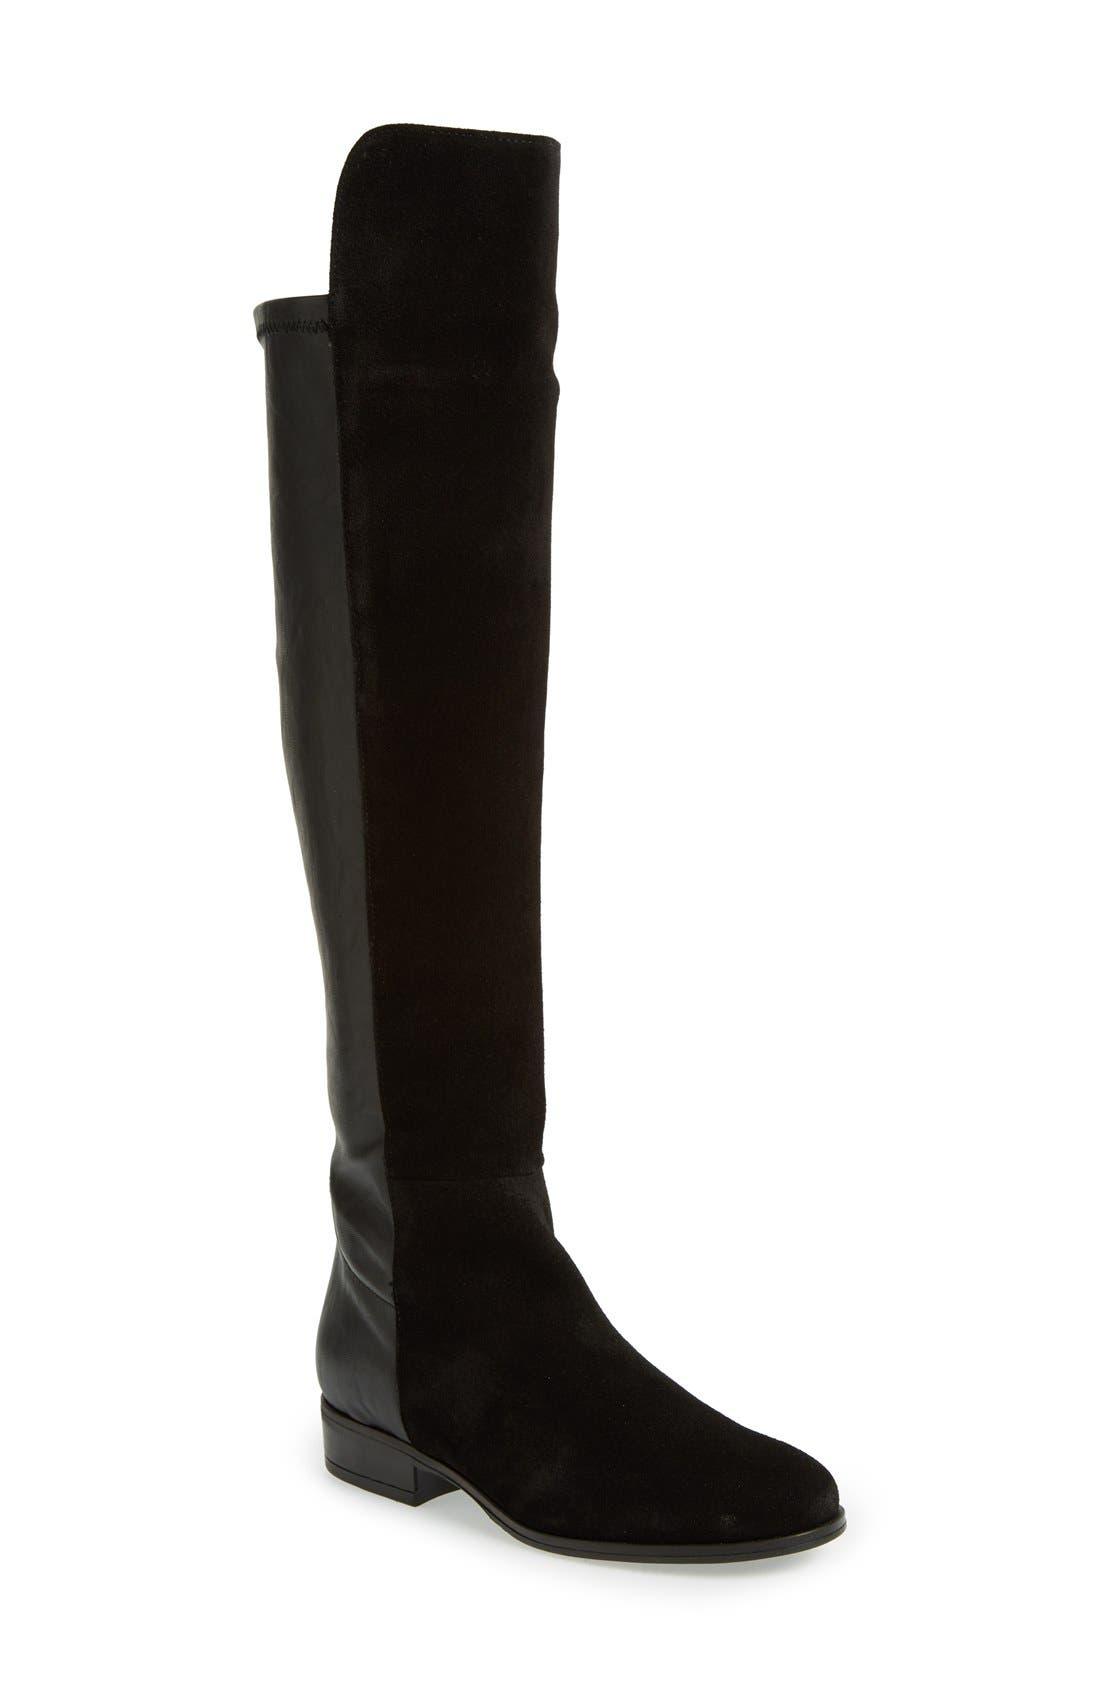 Alternate Image 1 Selected - Dune London 'Trish' Over the Knee Boot (Women)